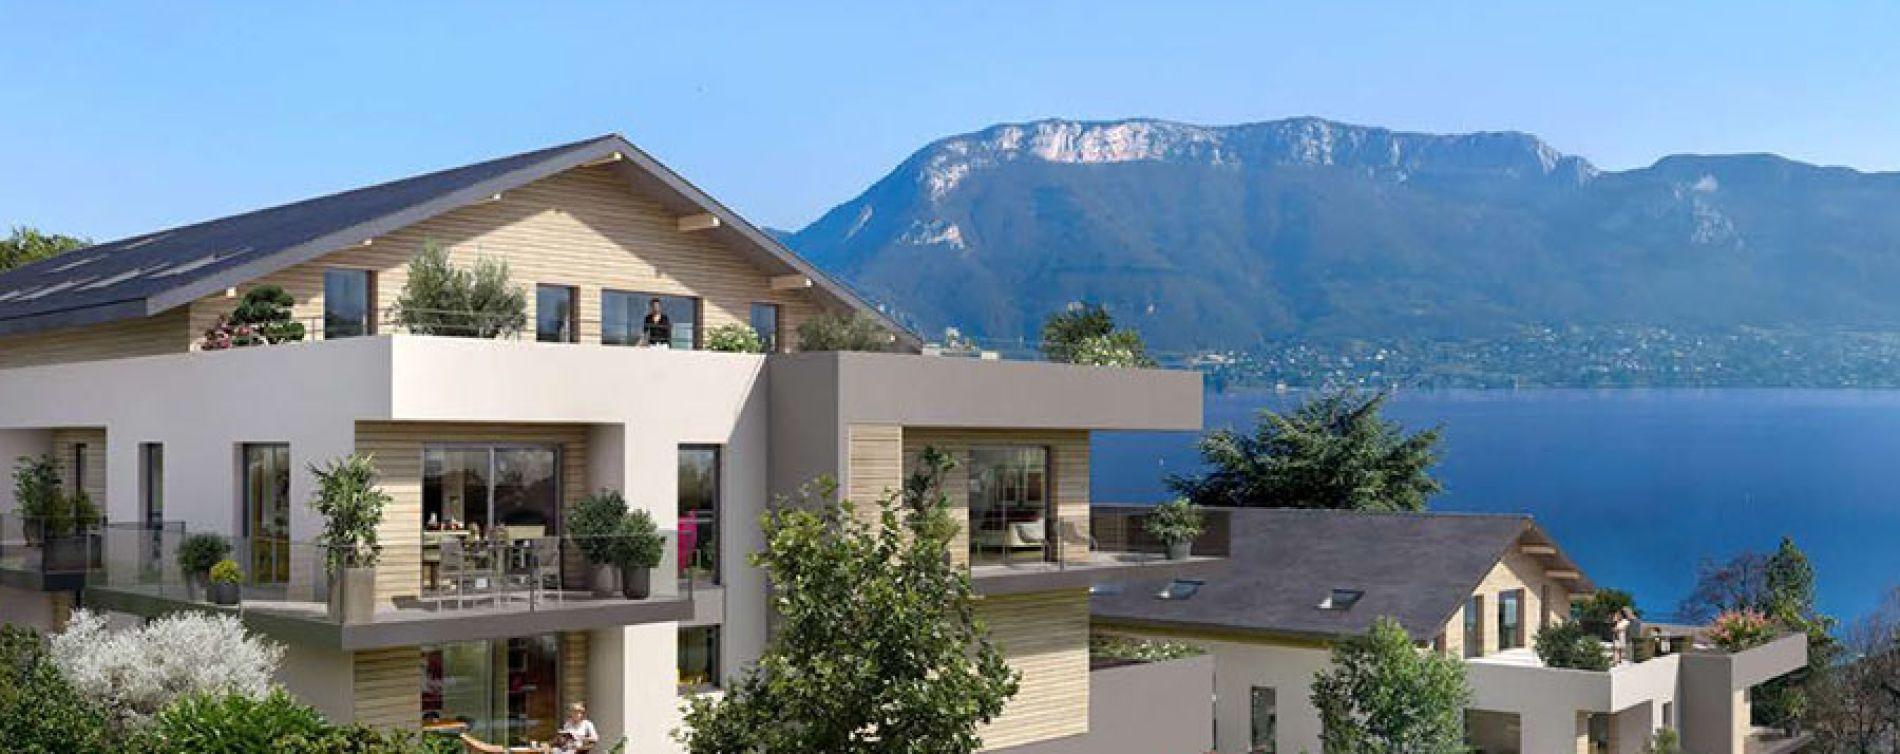 les terrasses du lac s vrier programme immobilier neuf n. Black Bedroom Furniture Sets. Home Design Ideas